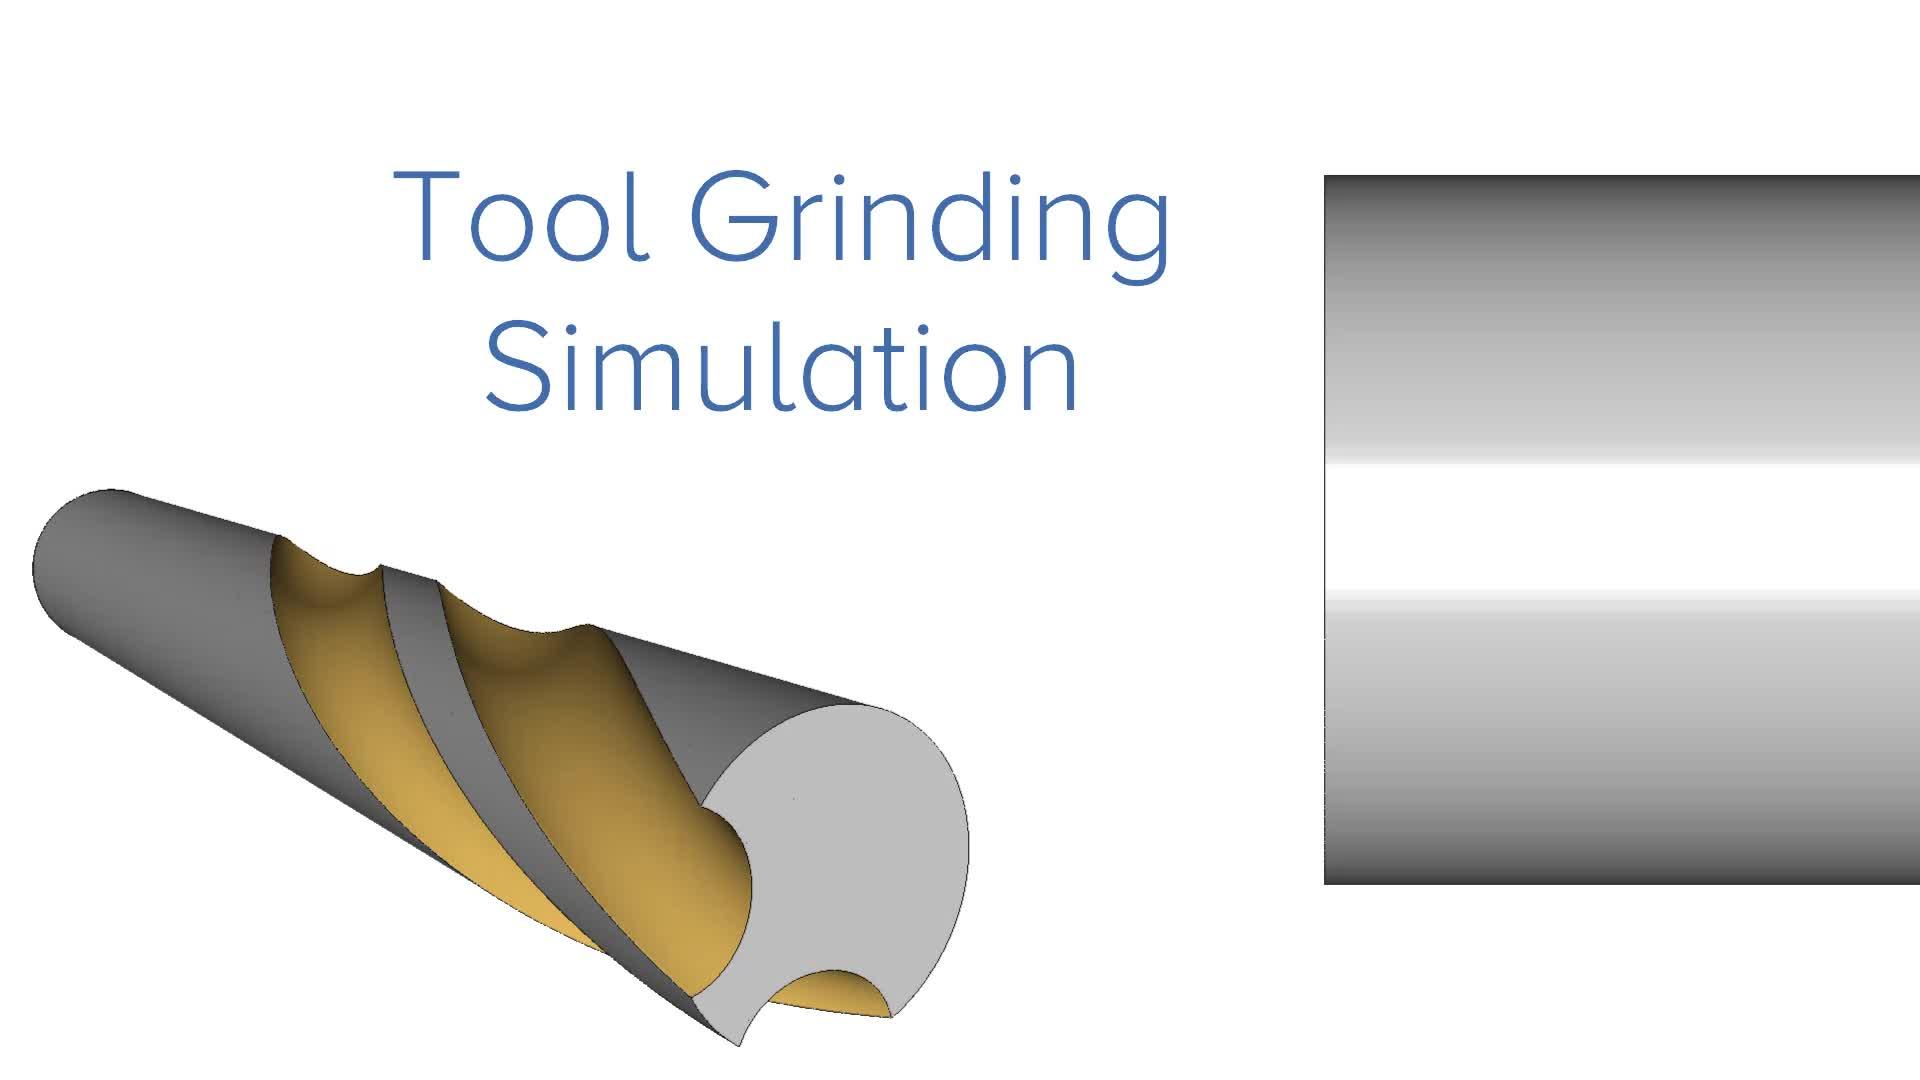 Tool Grinding Simulation